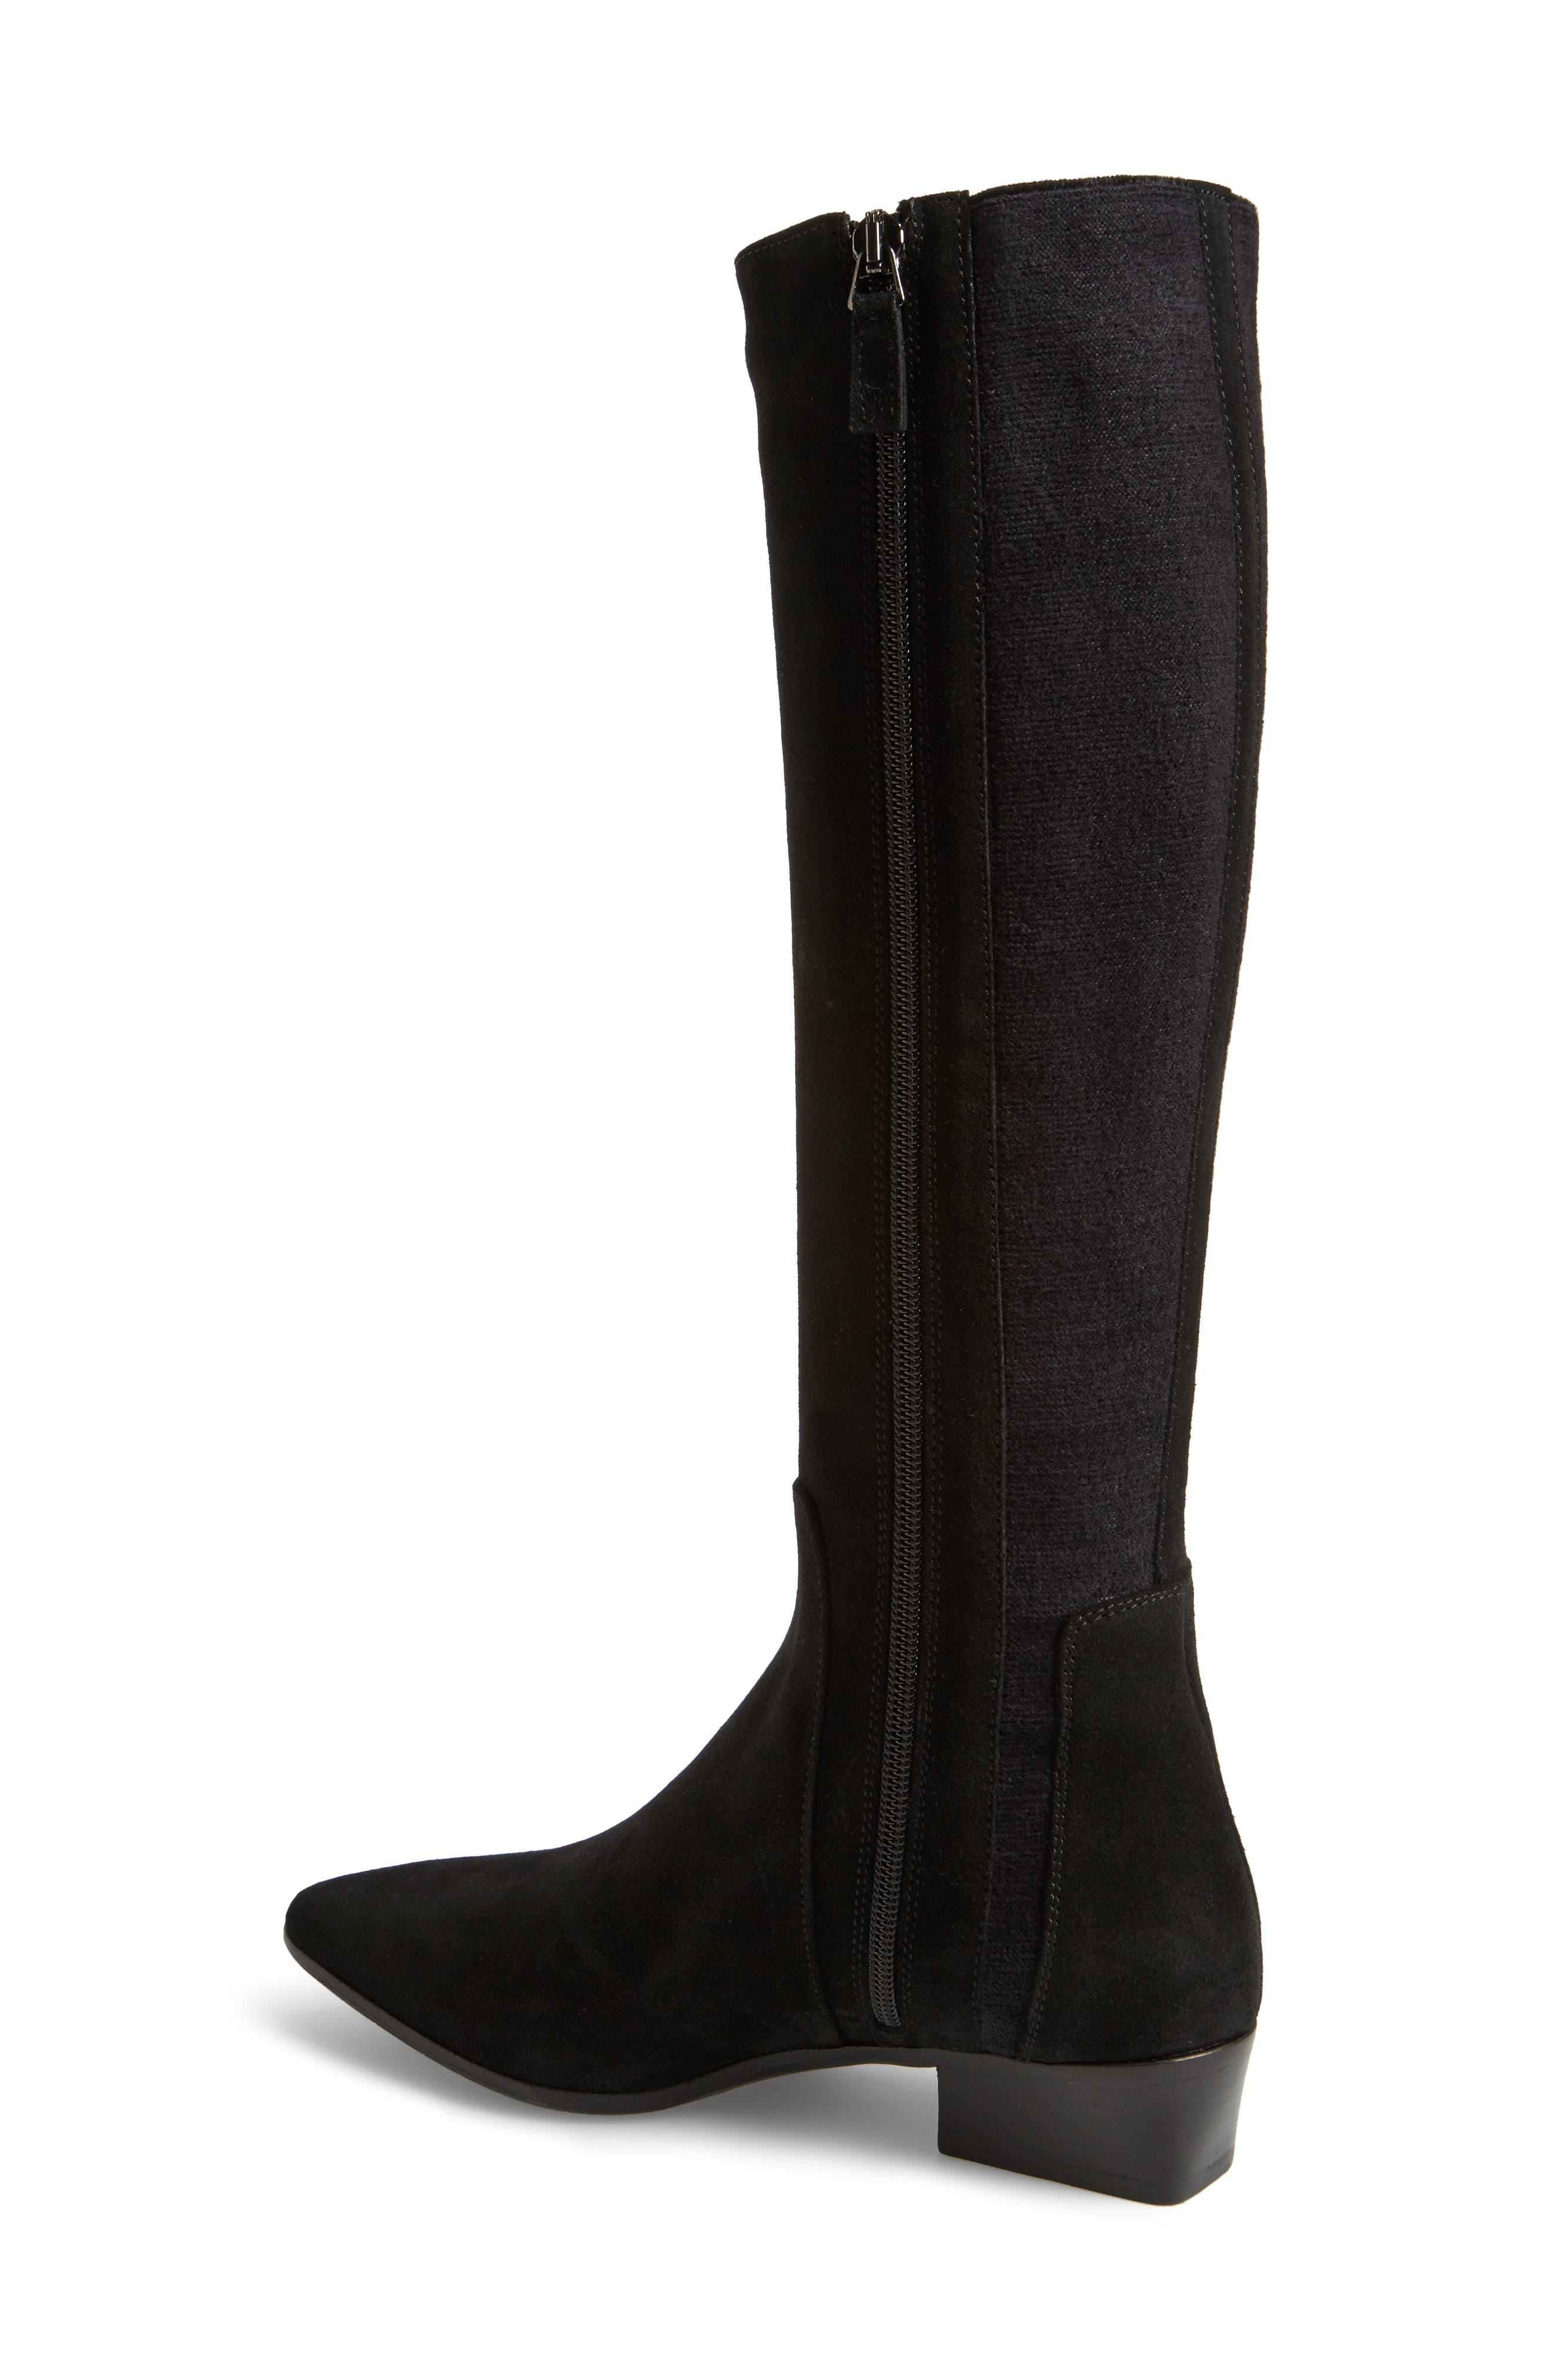 Federica Weatherproof Knee High Boot,                             Alternate thumbnail 2, color,                             001